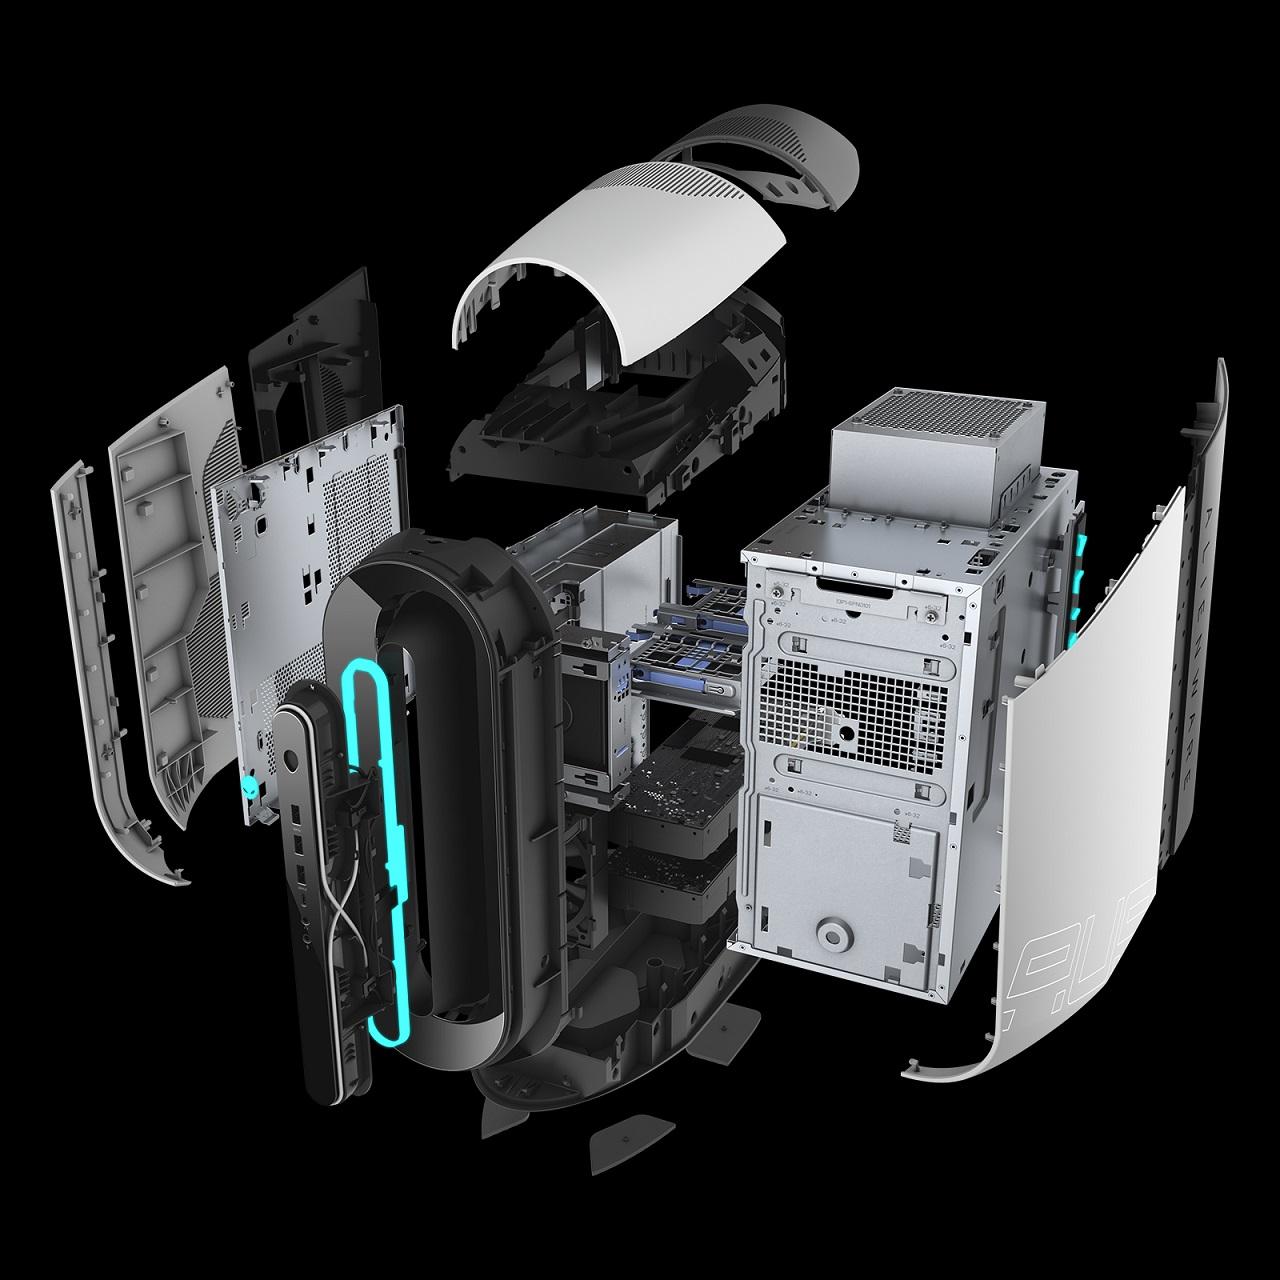 Dell has unveiled the Alienware Aurora R9 desktop at Gamescom 2019 8